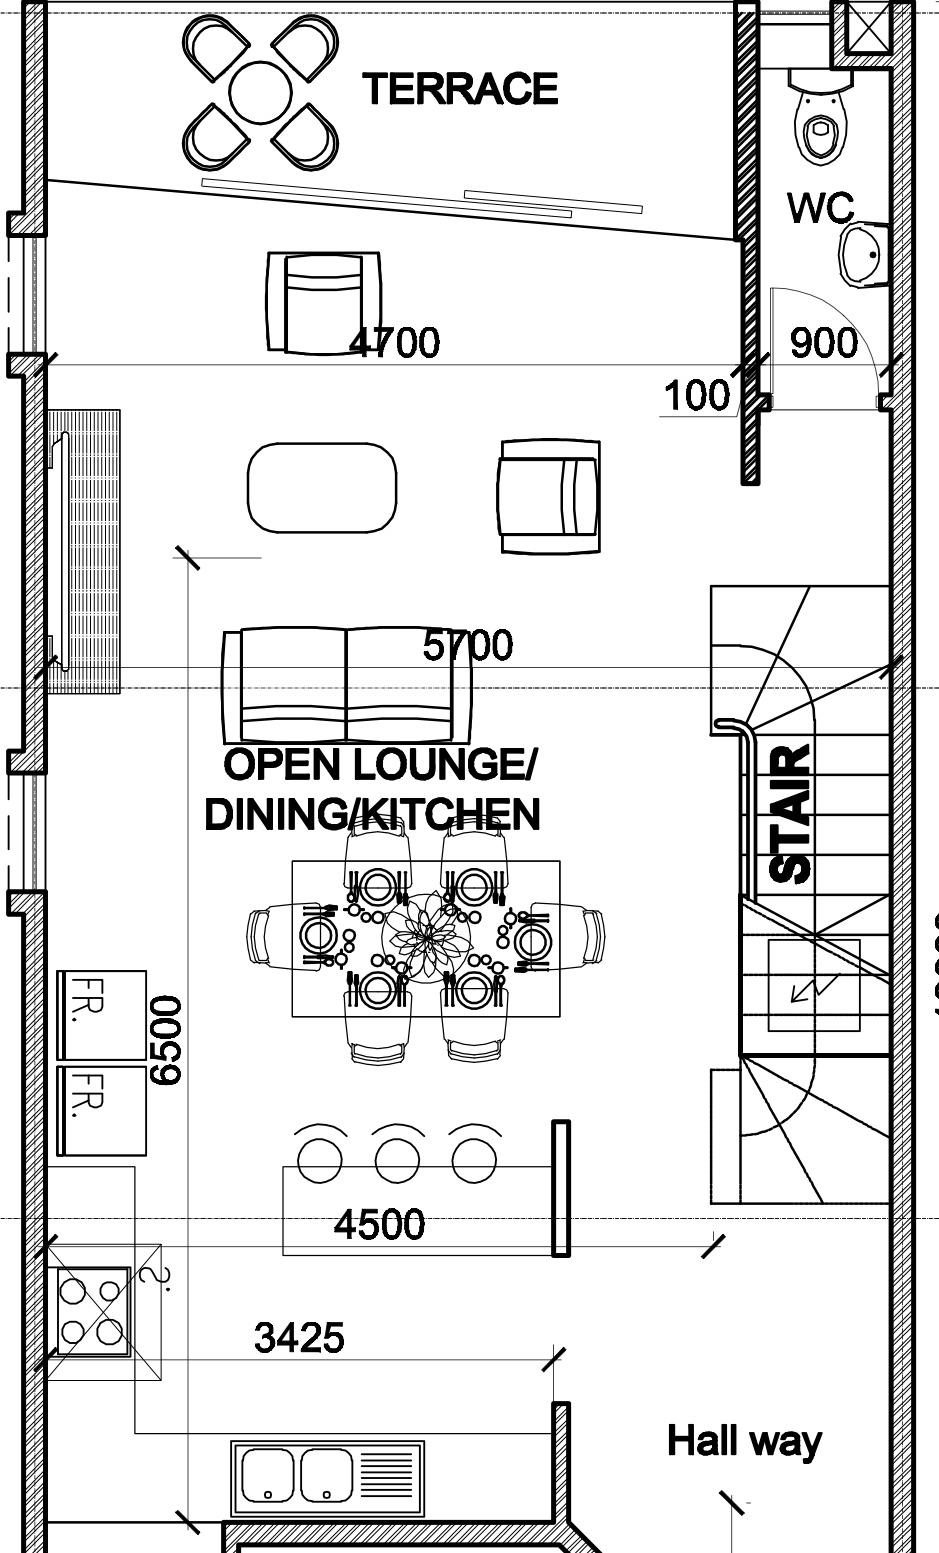 Loft Loungepic.jpg